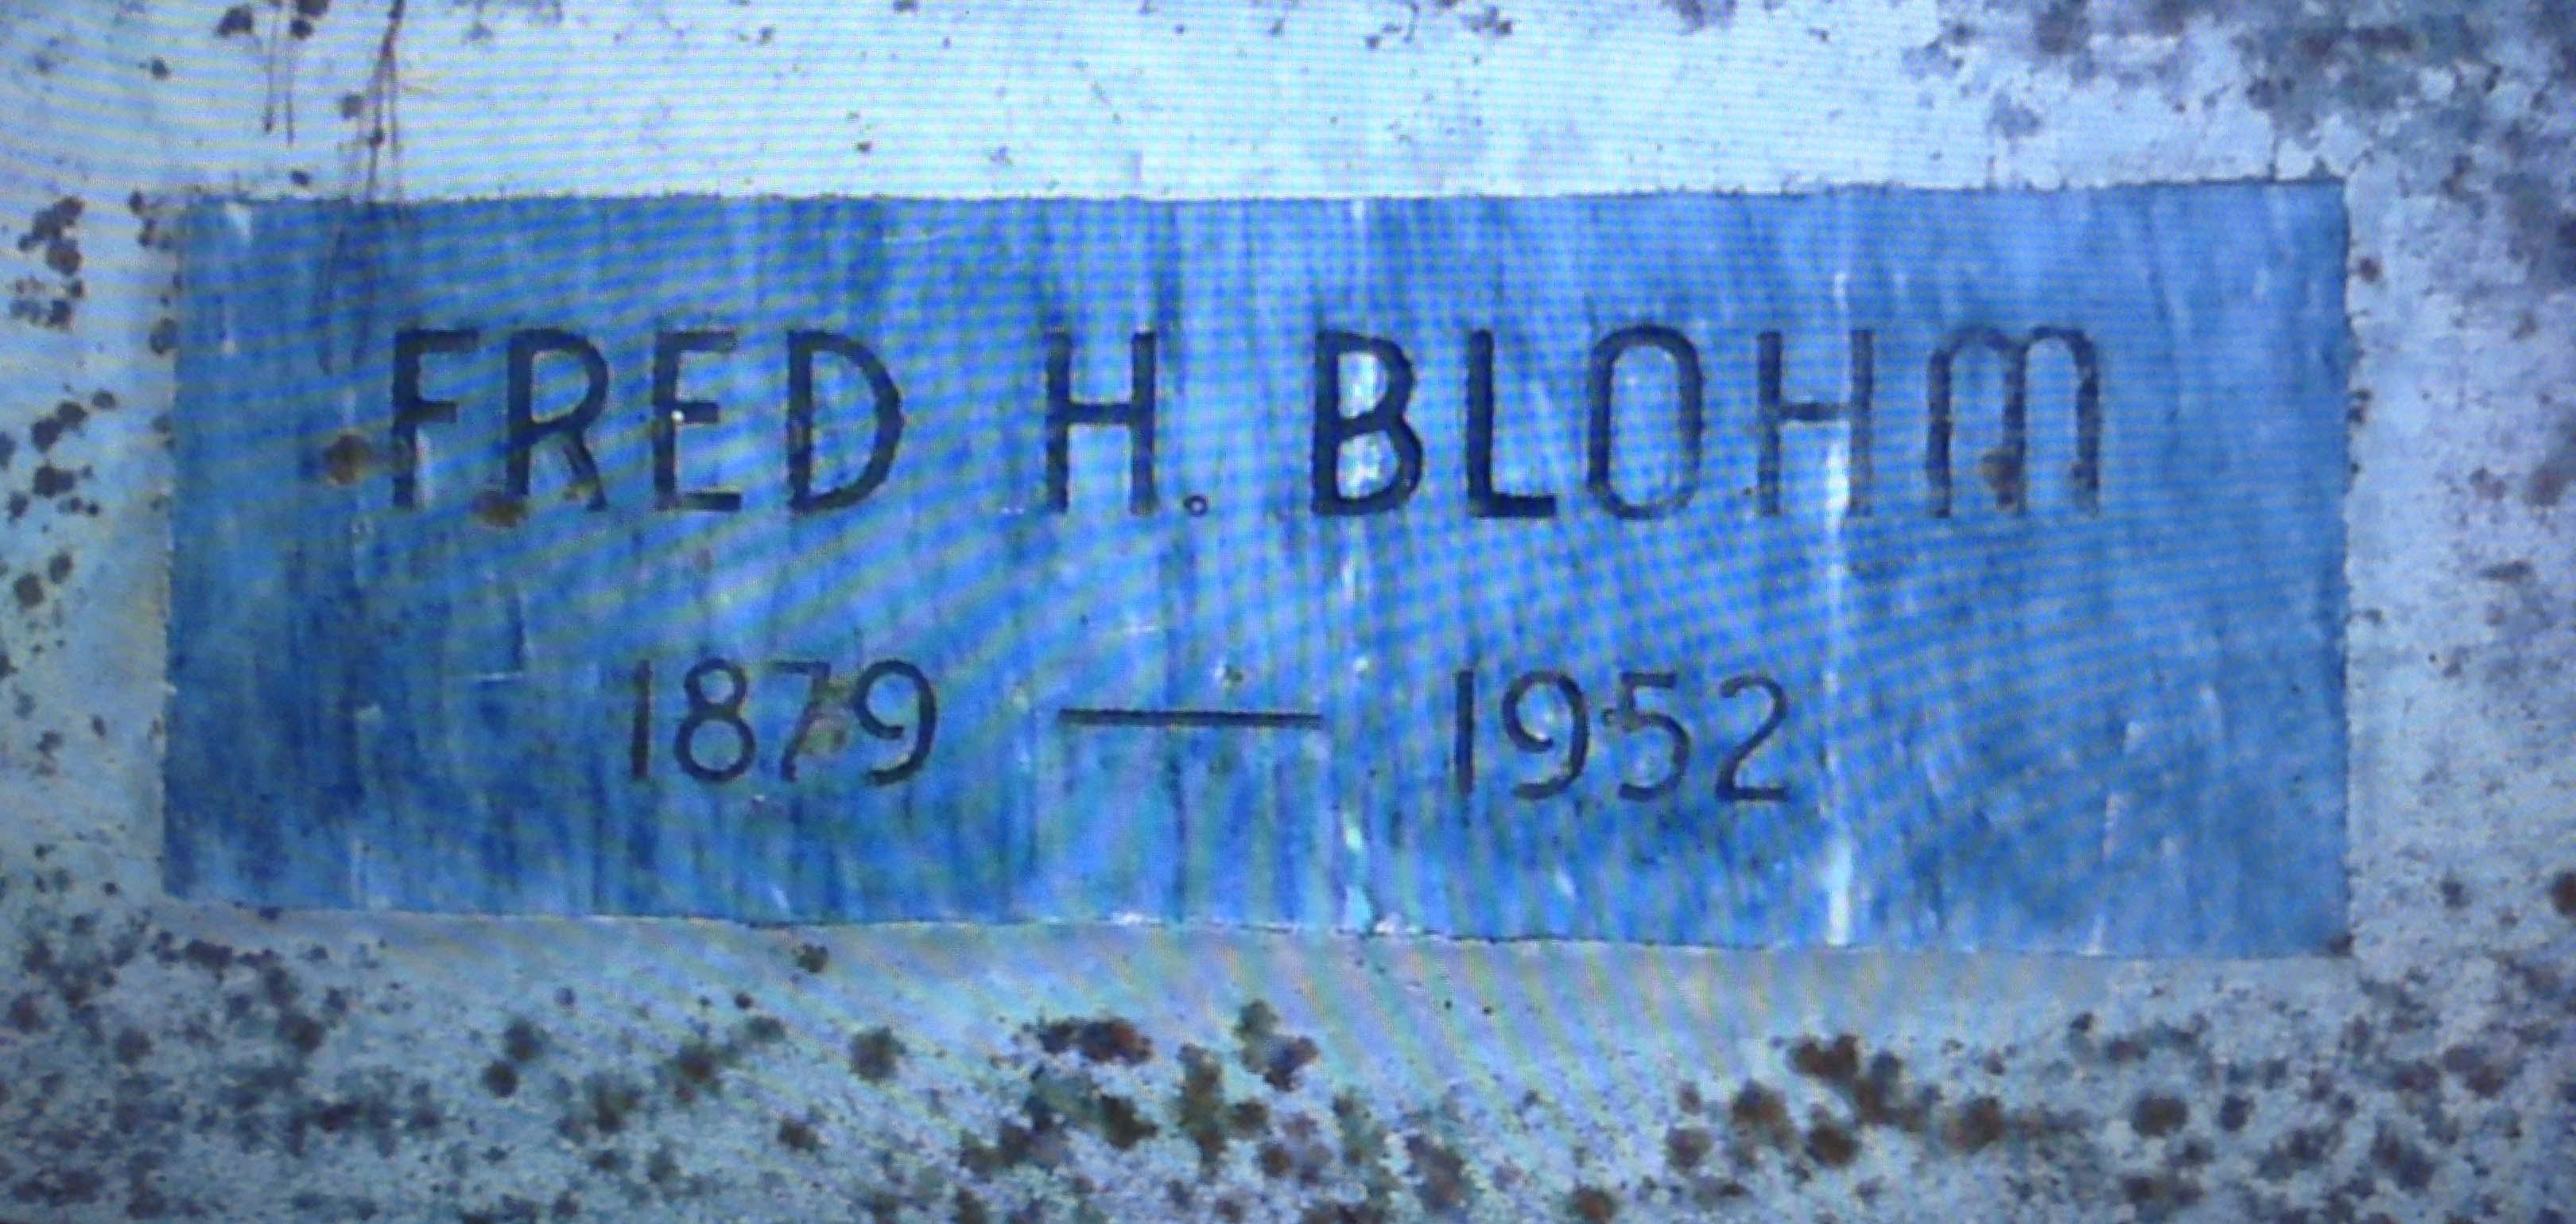 Fred Hugo Blohm